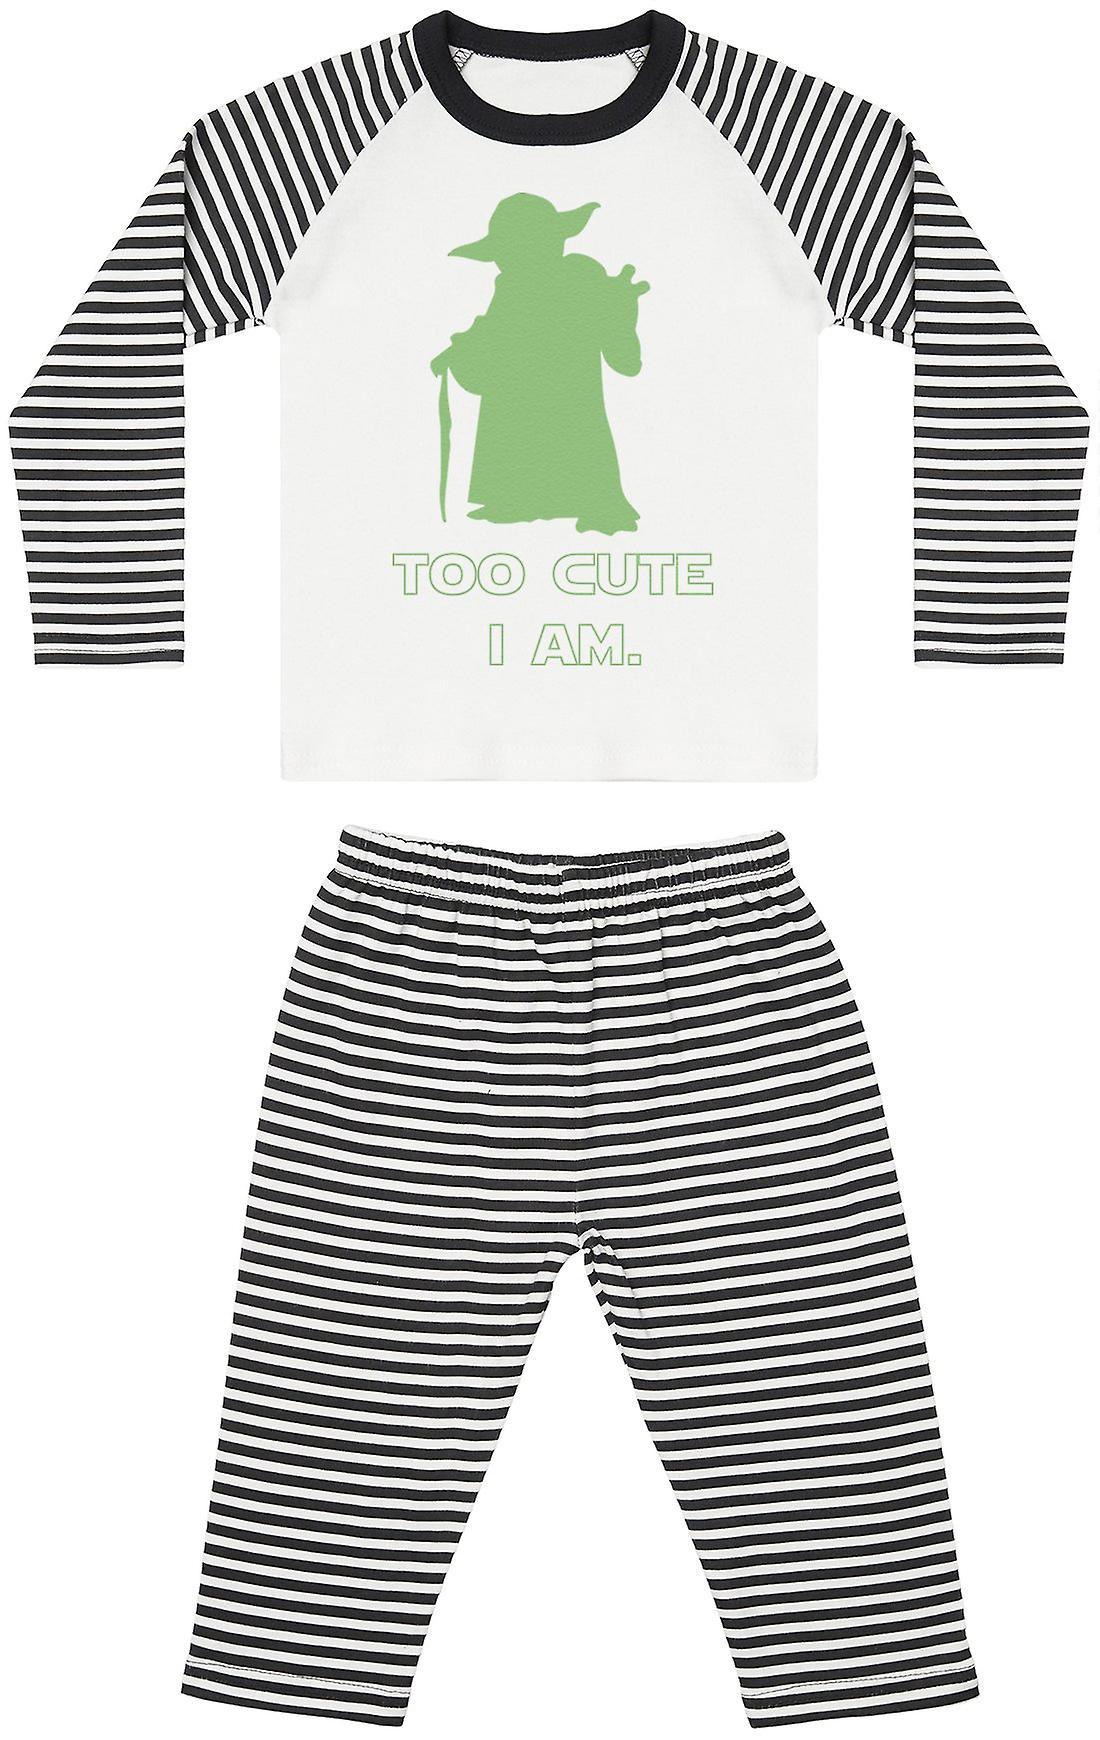 Too Cute I Am - Baby Pyjamas